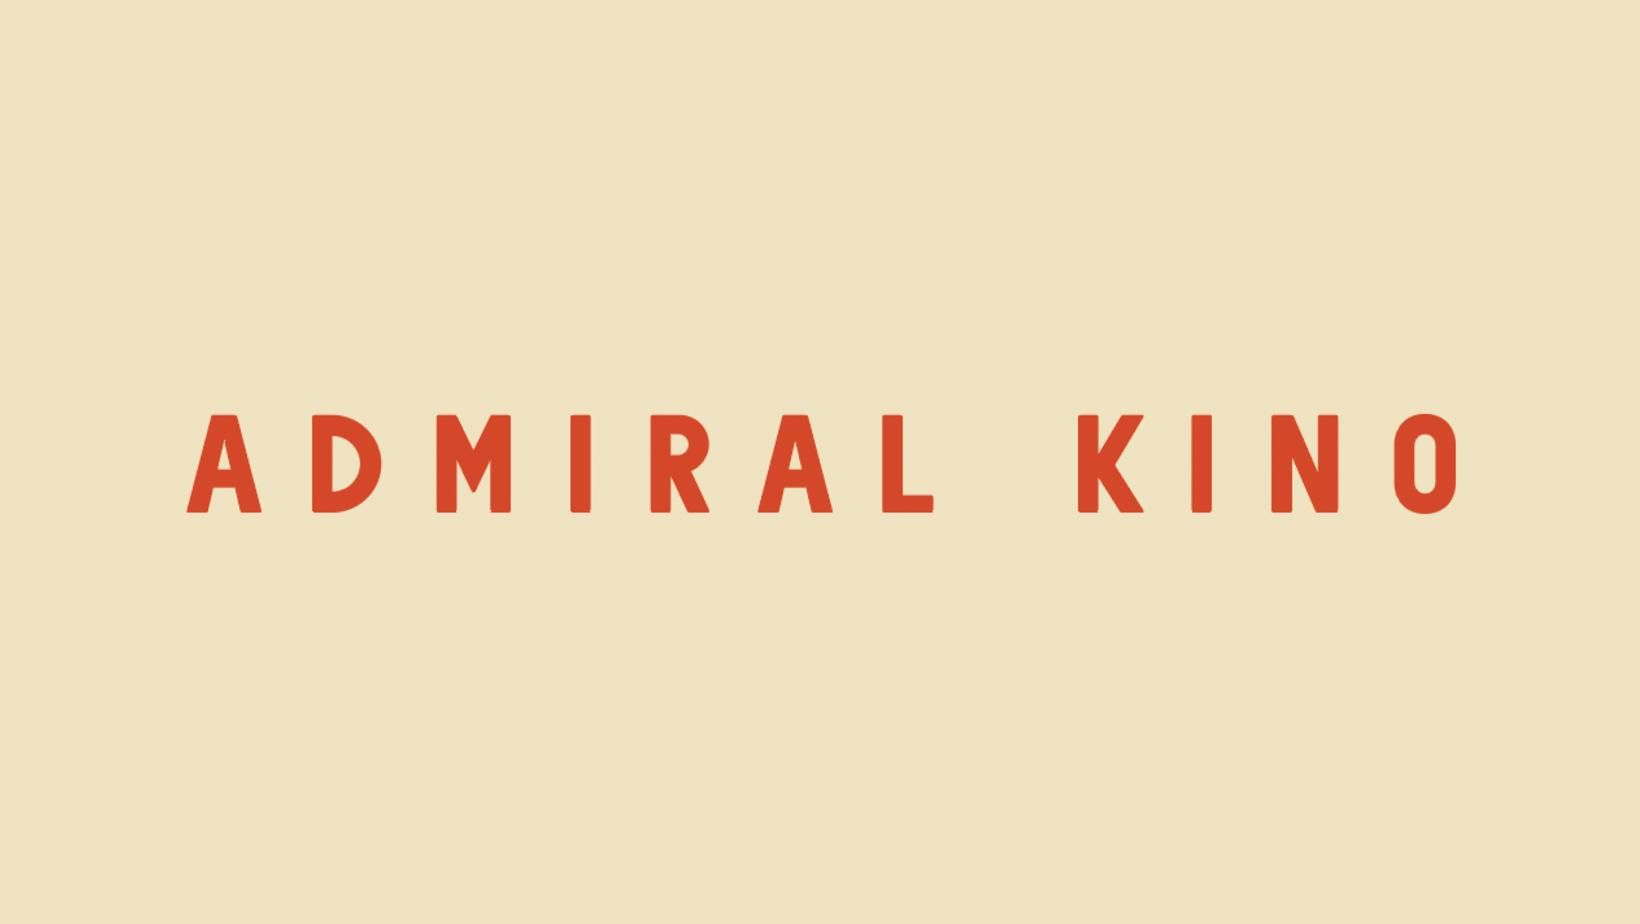 Admiralkino